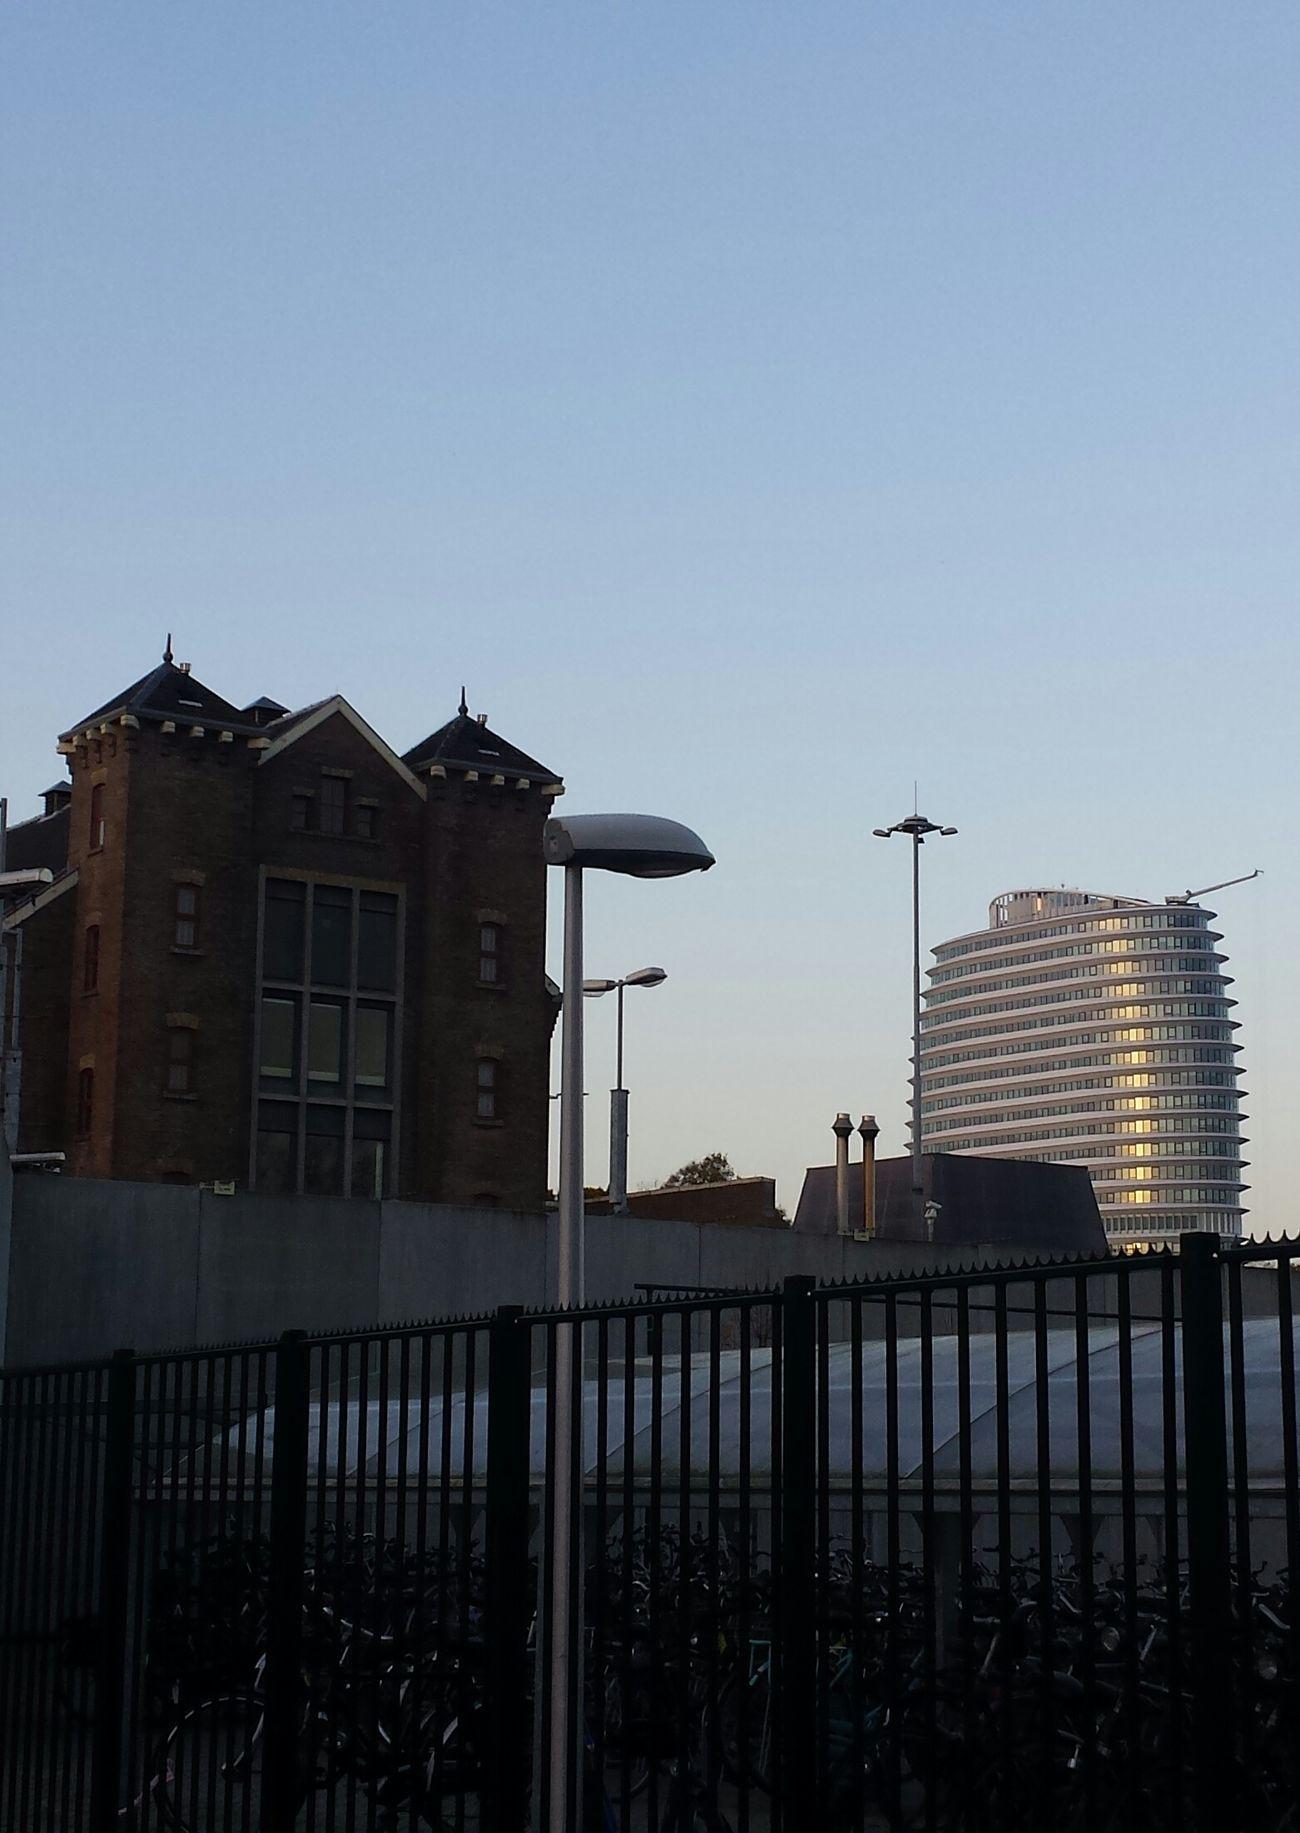 Global EyeEm Adventure - Groningen Eyeemgroupnederland Buildings Photography